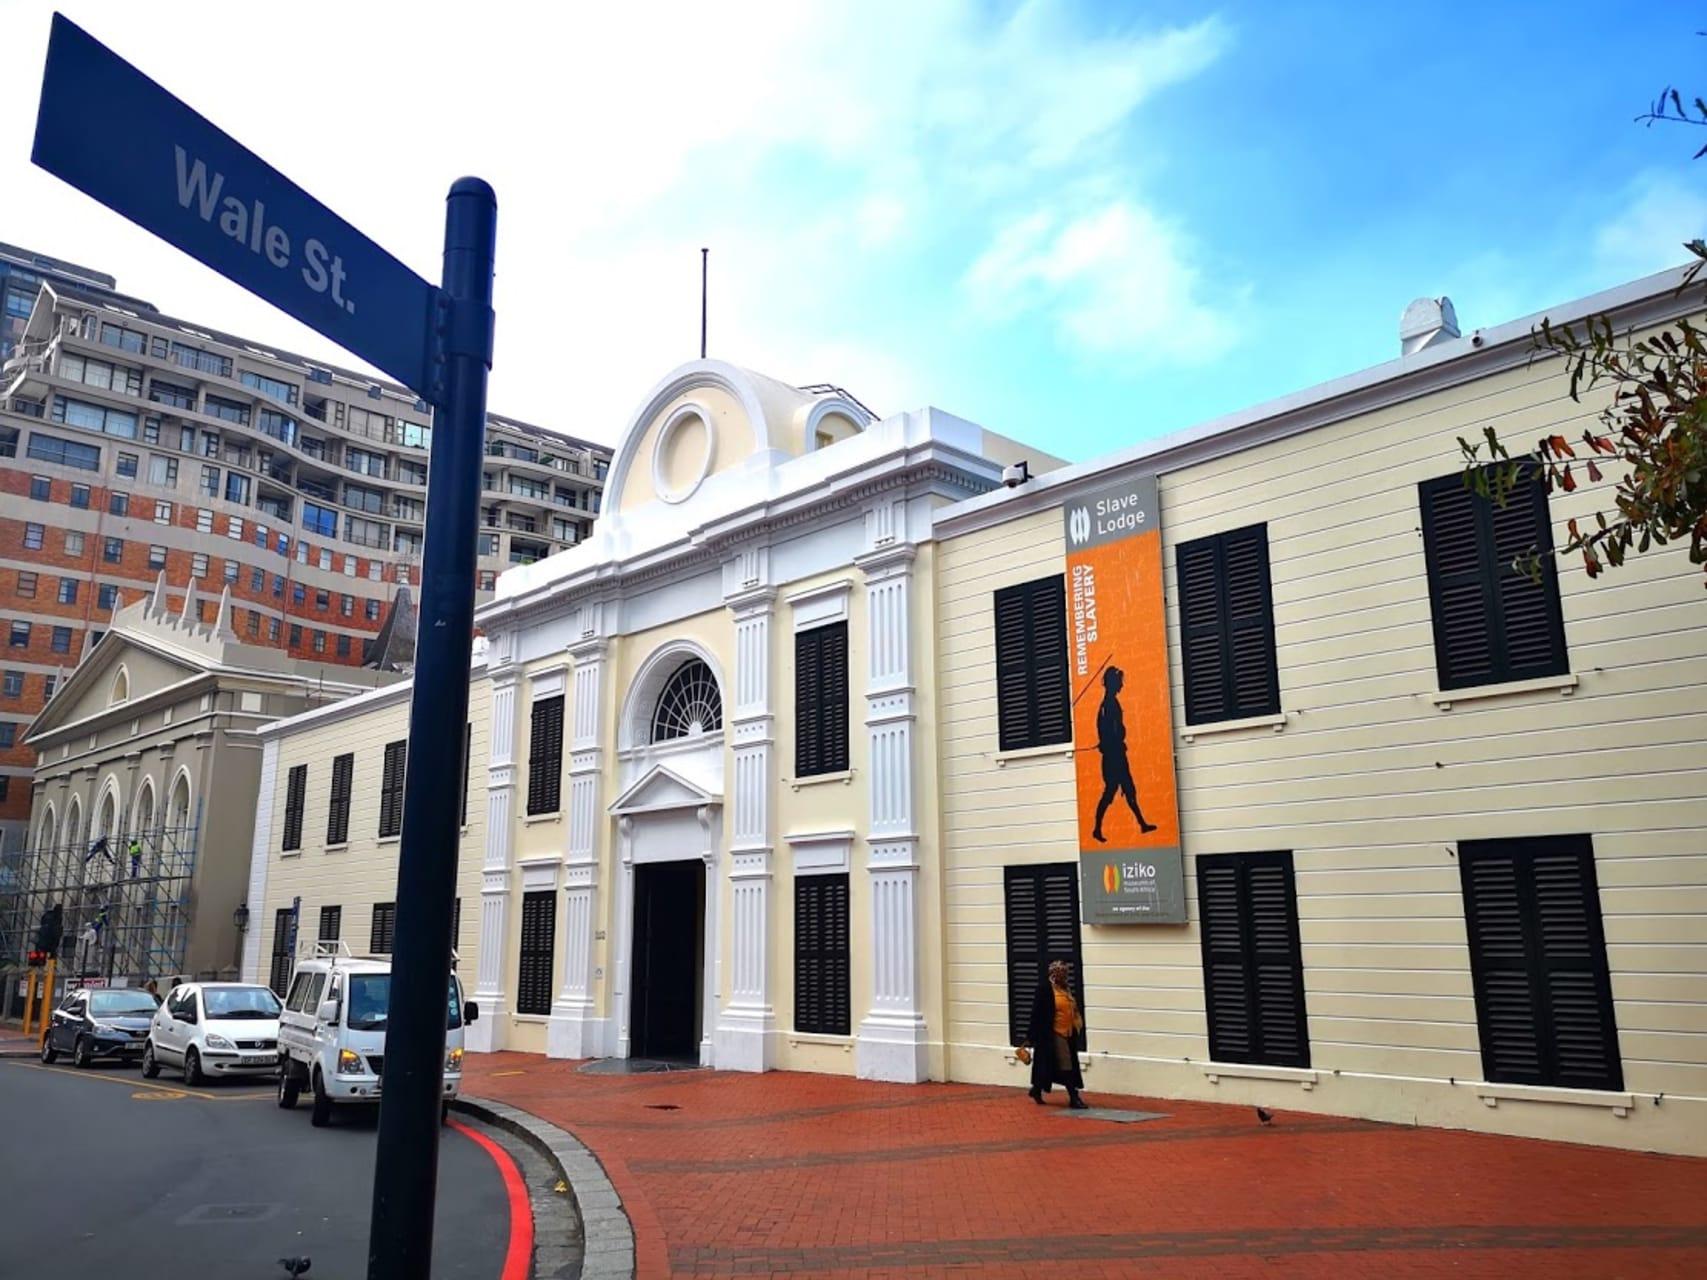 Cape Town - Cape Town & its Landmarks